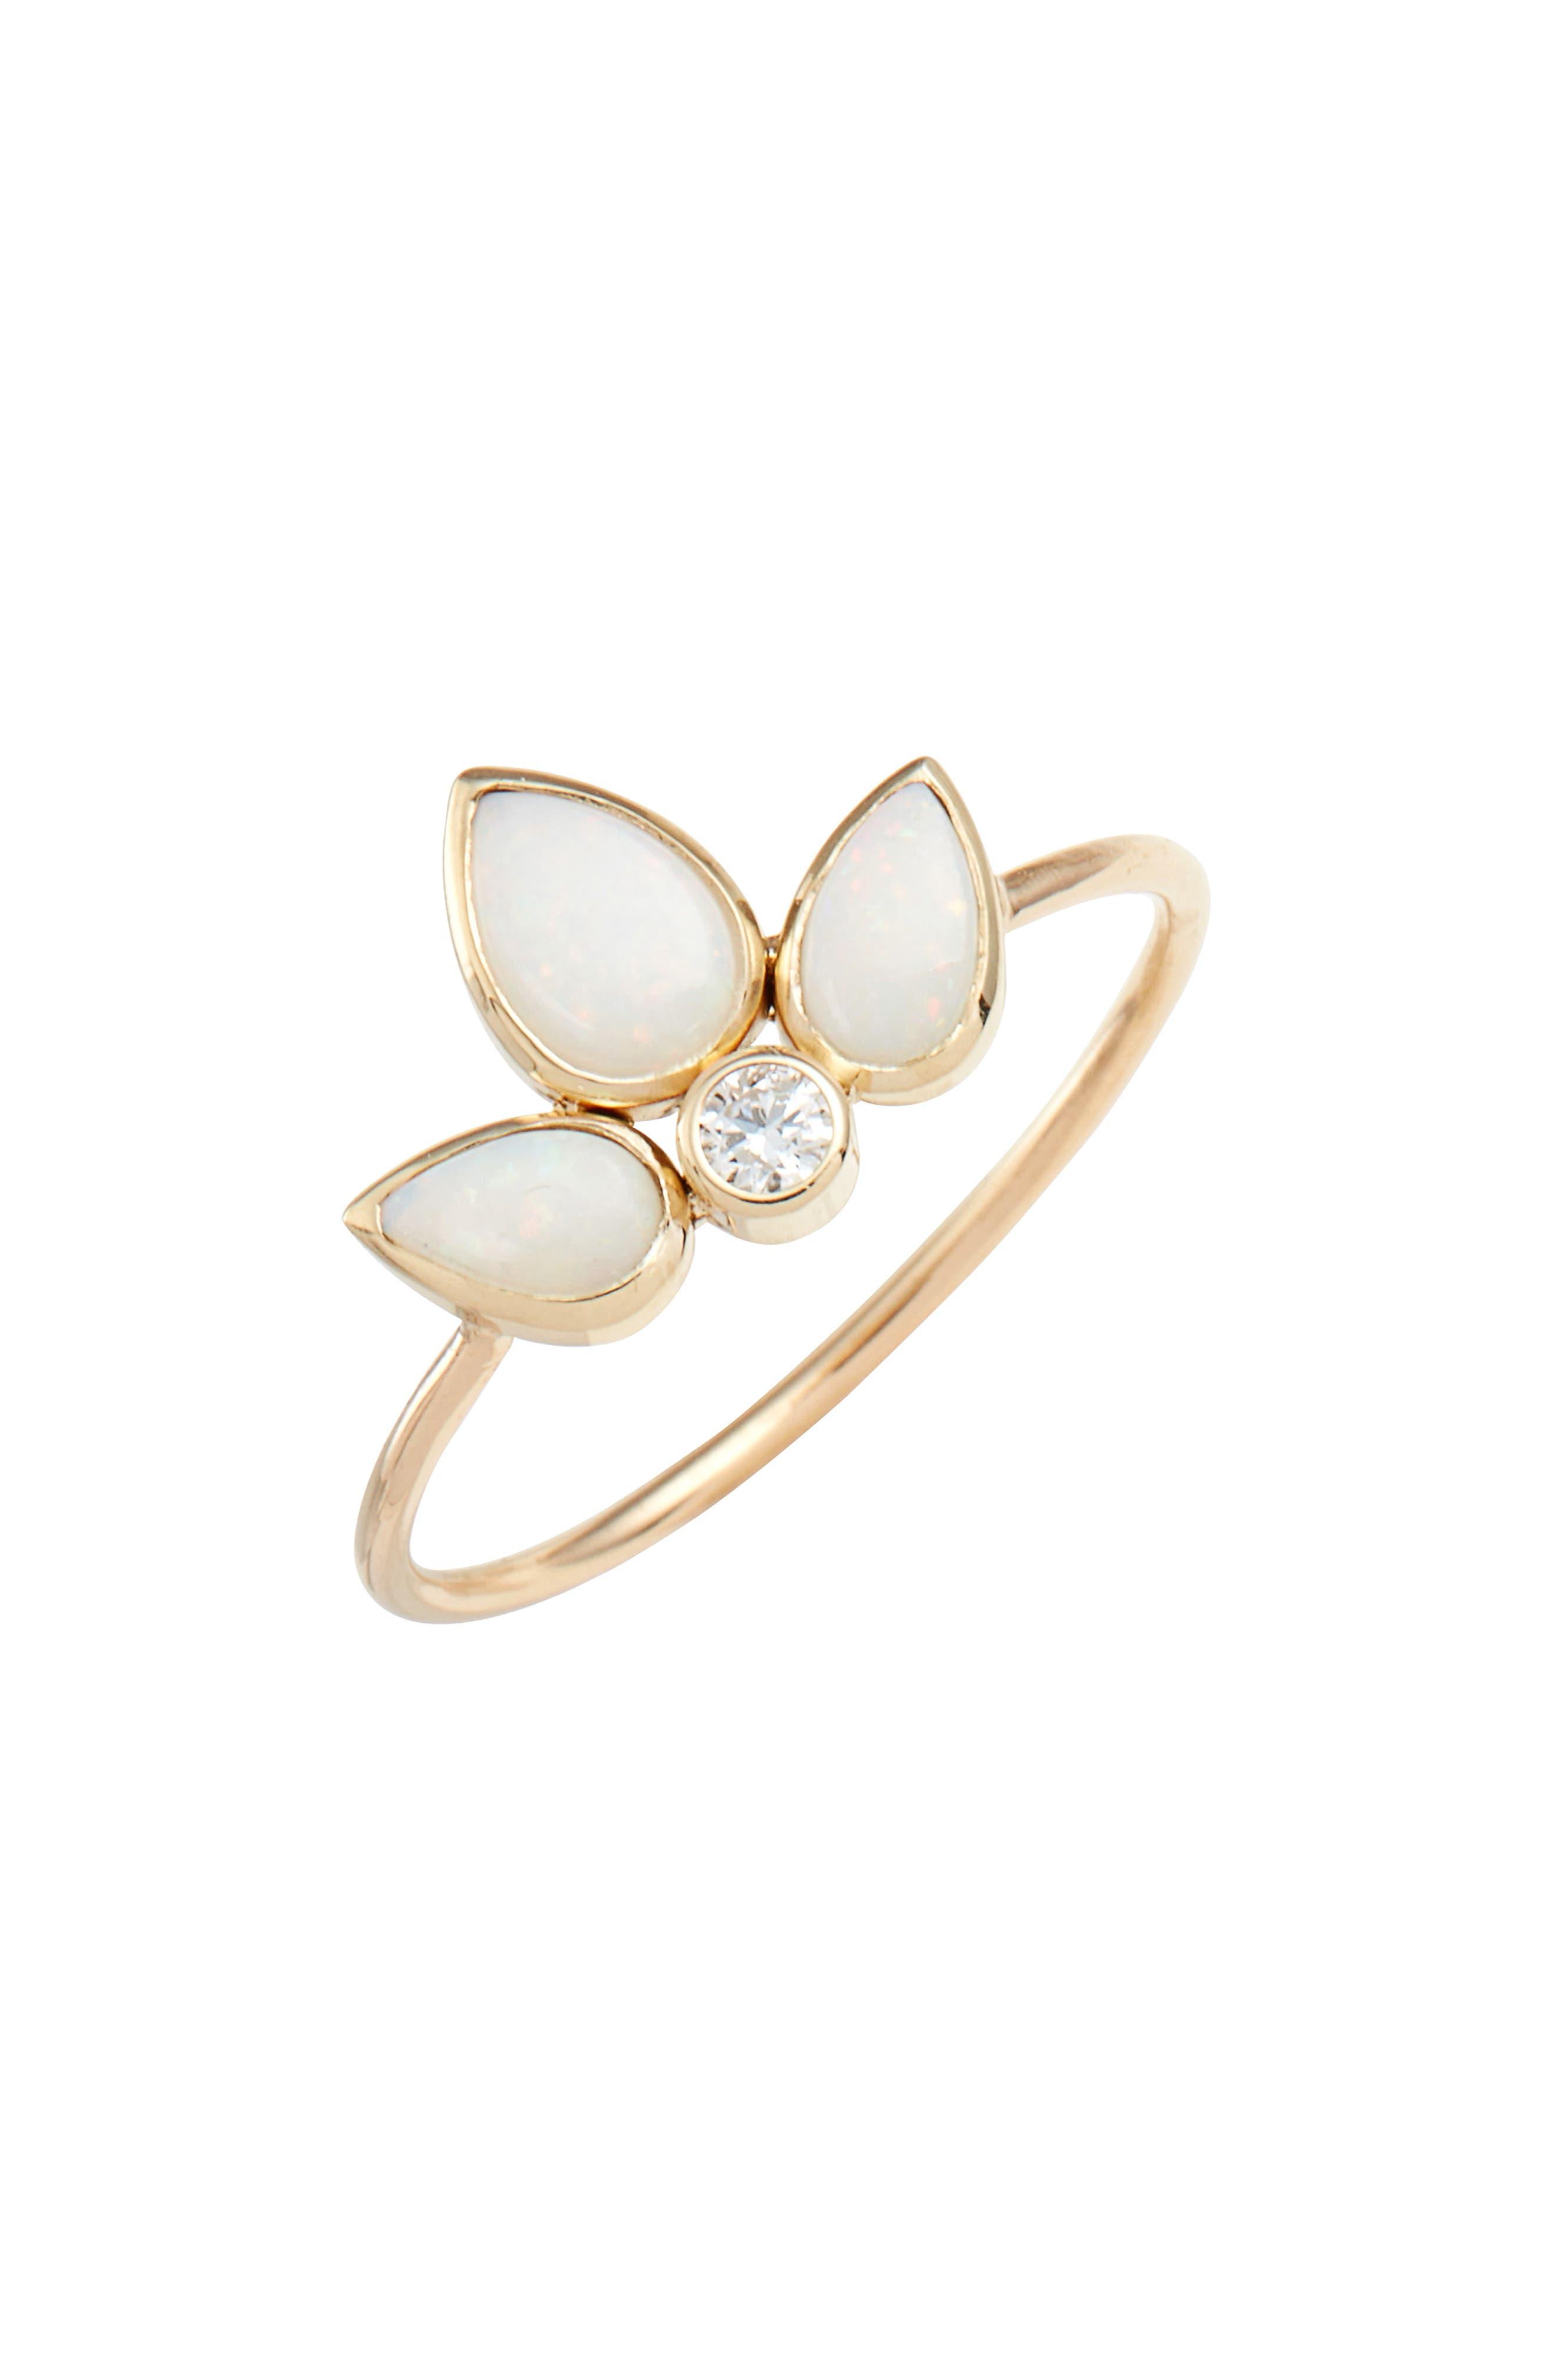 Diamond Bezel Ring,                             Main thumbnail 1, color,                             YELLOW GOLD/ OPAL